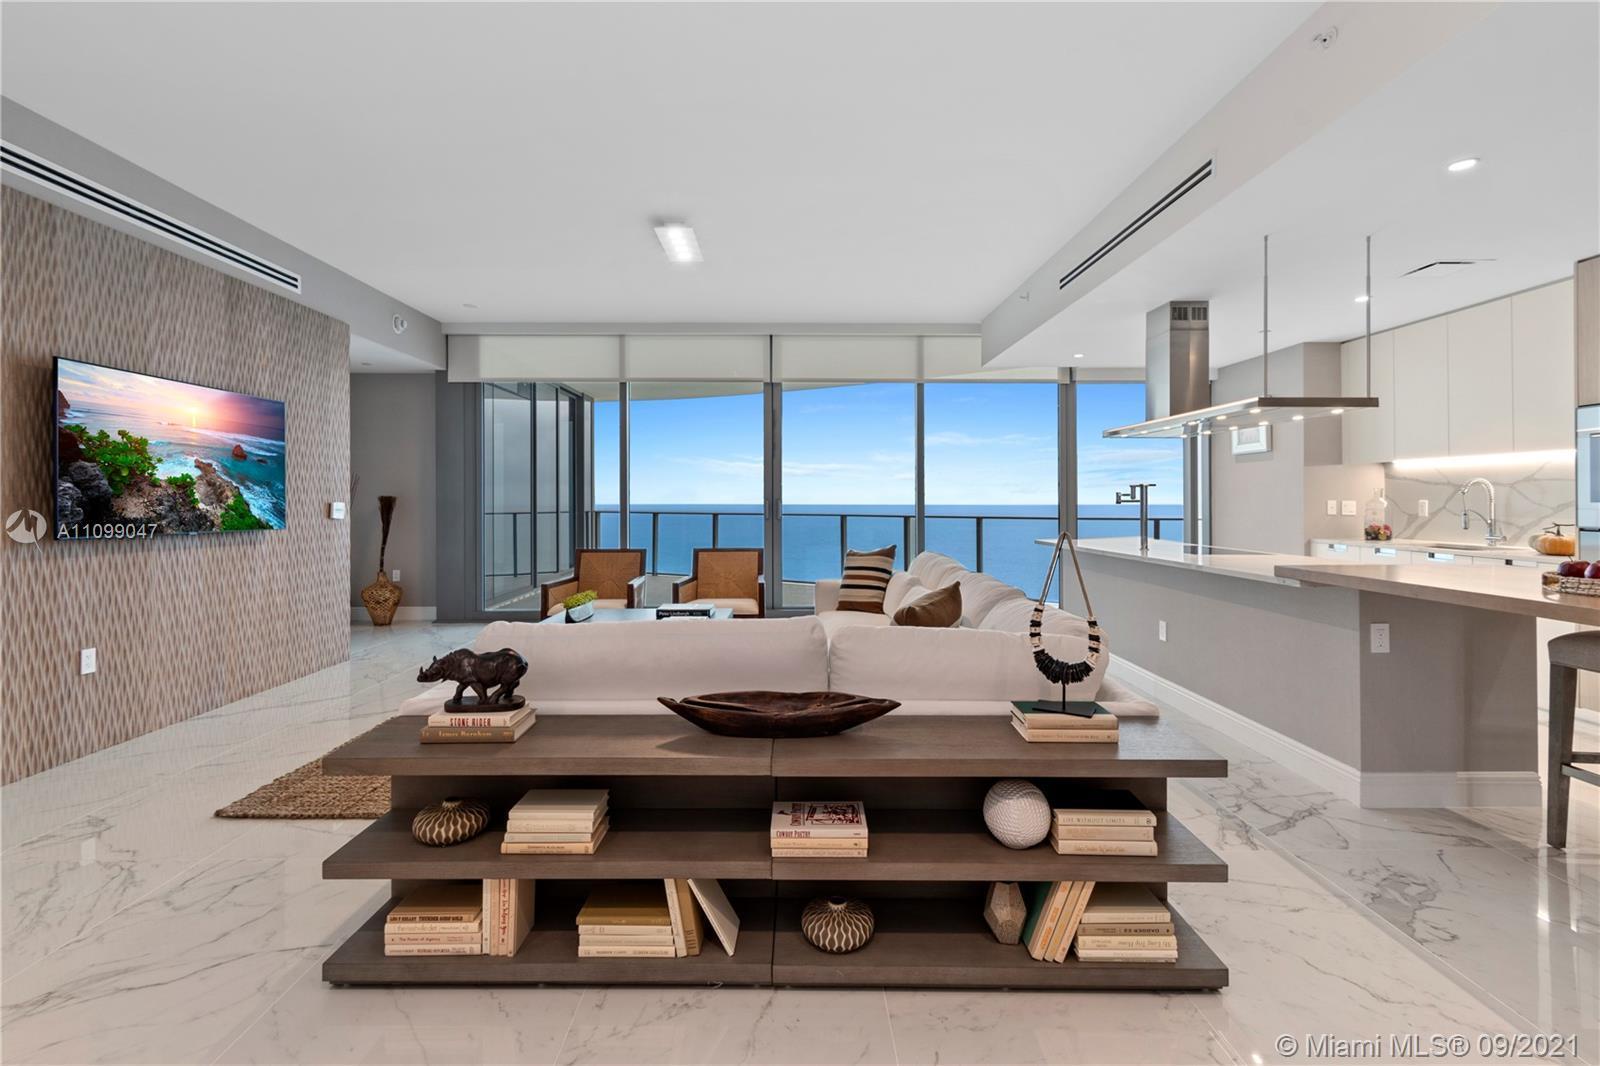 Stunning 3 Bedroom + 3.5 Bathrooms flow-through unit at The Ritz-Carlton Residences Sunny Isles Beac